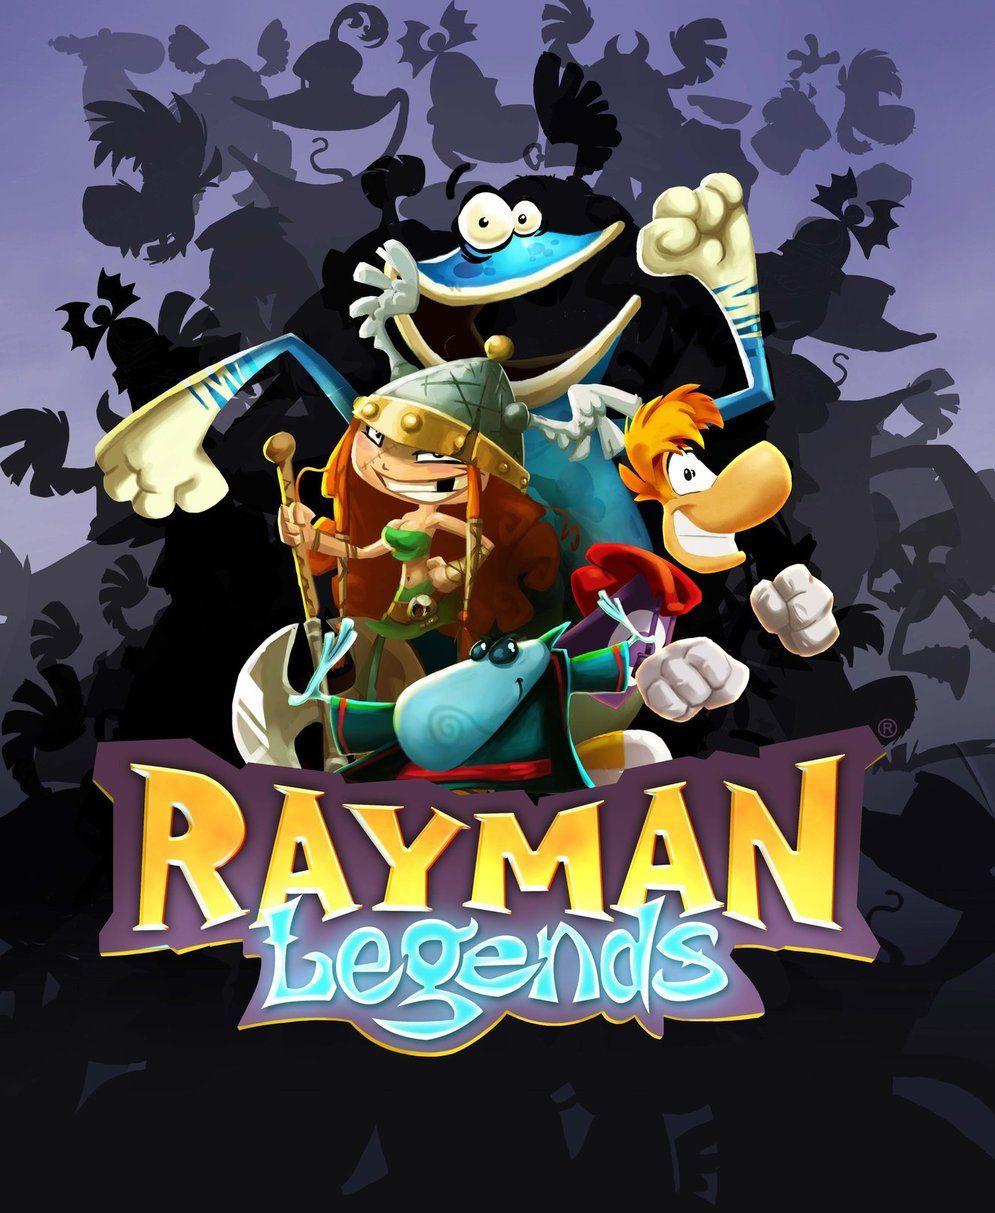 Rayman Legends No Longer Wii U Exclusive Rayman legends